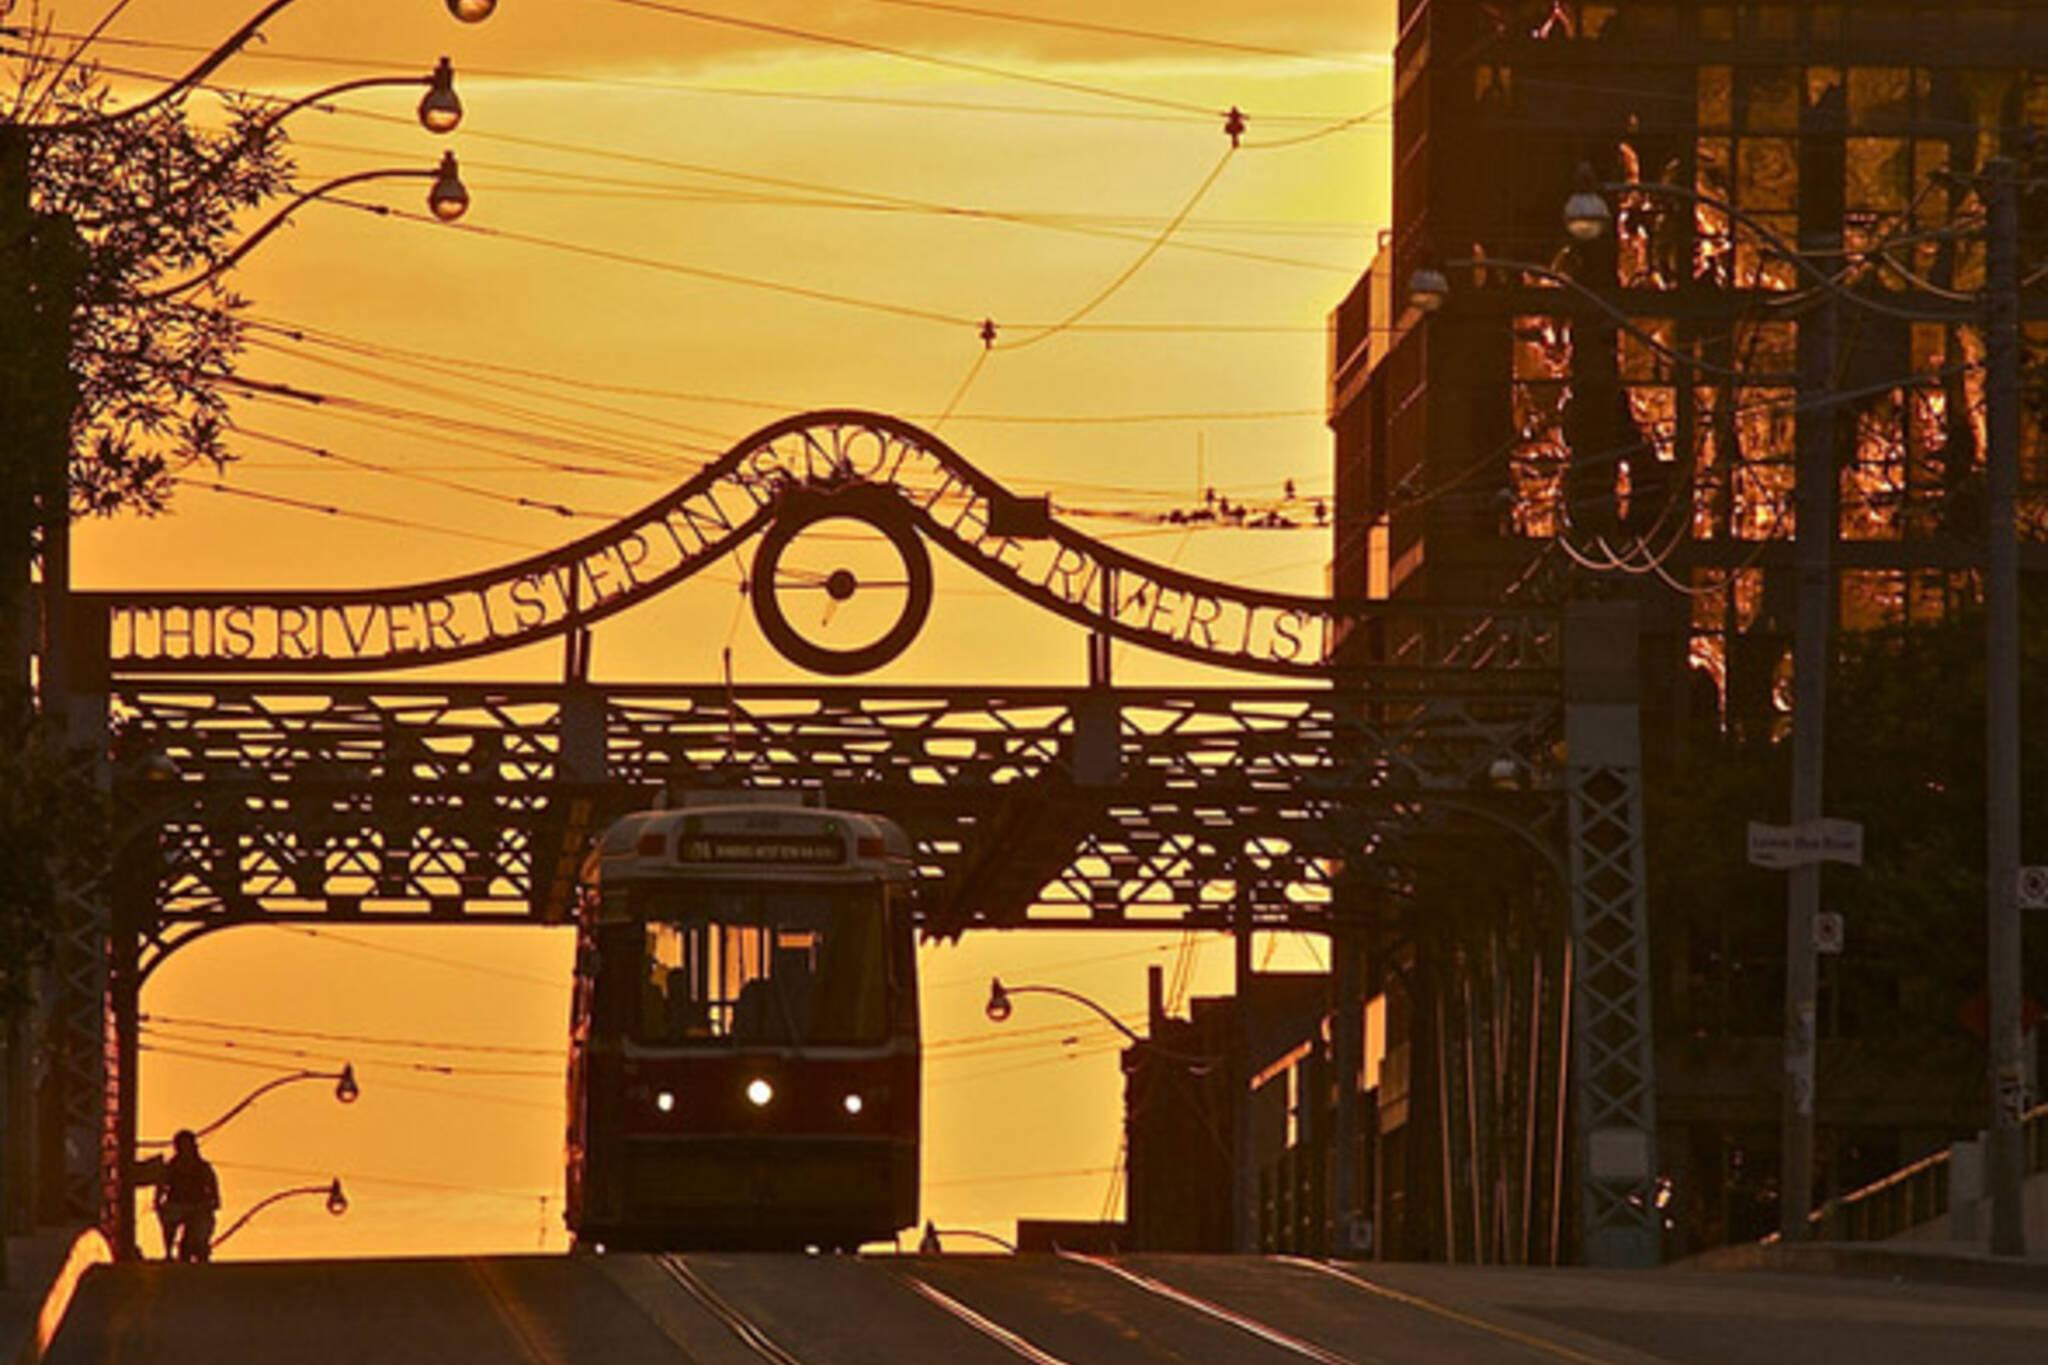 streetcar, street, sunrise